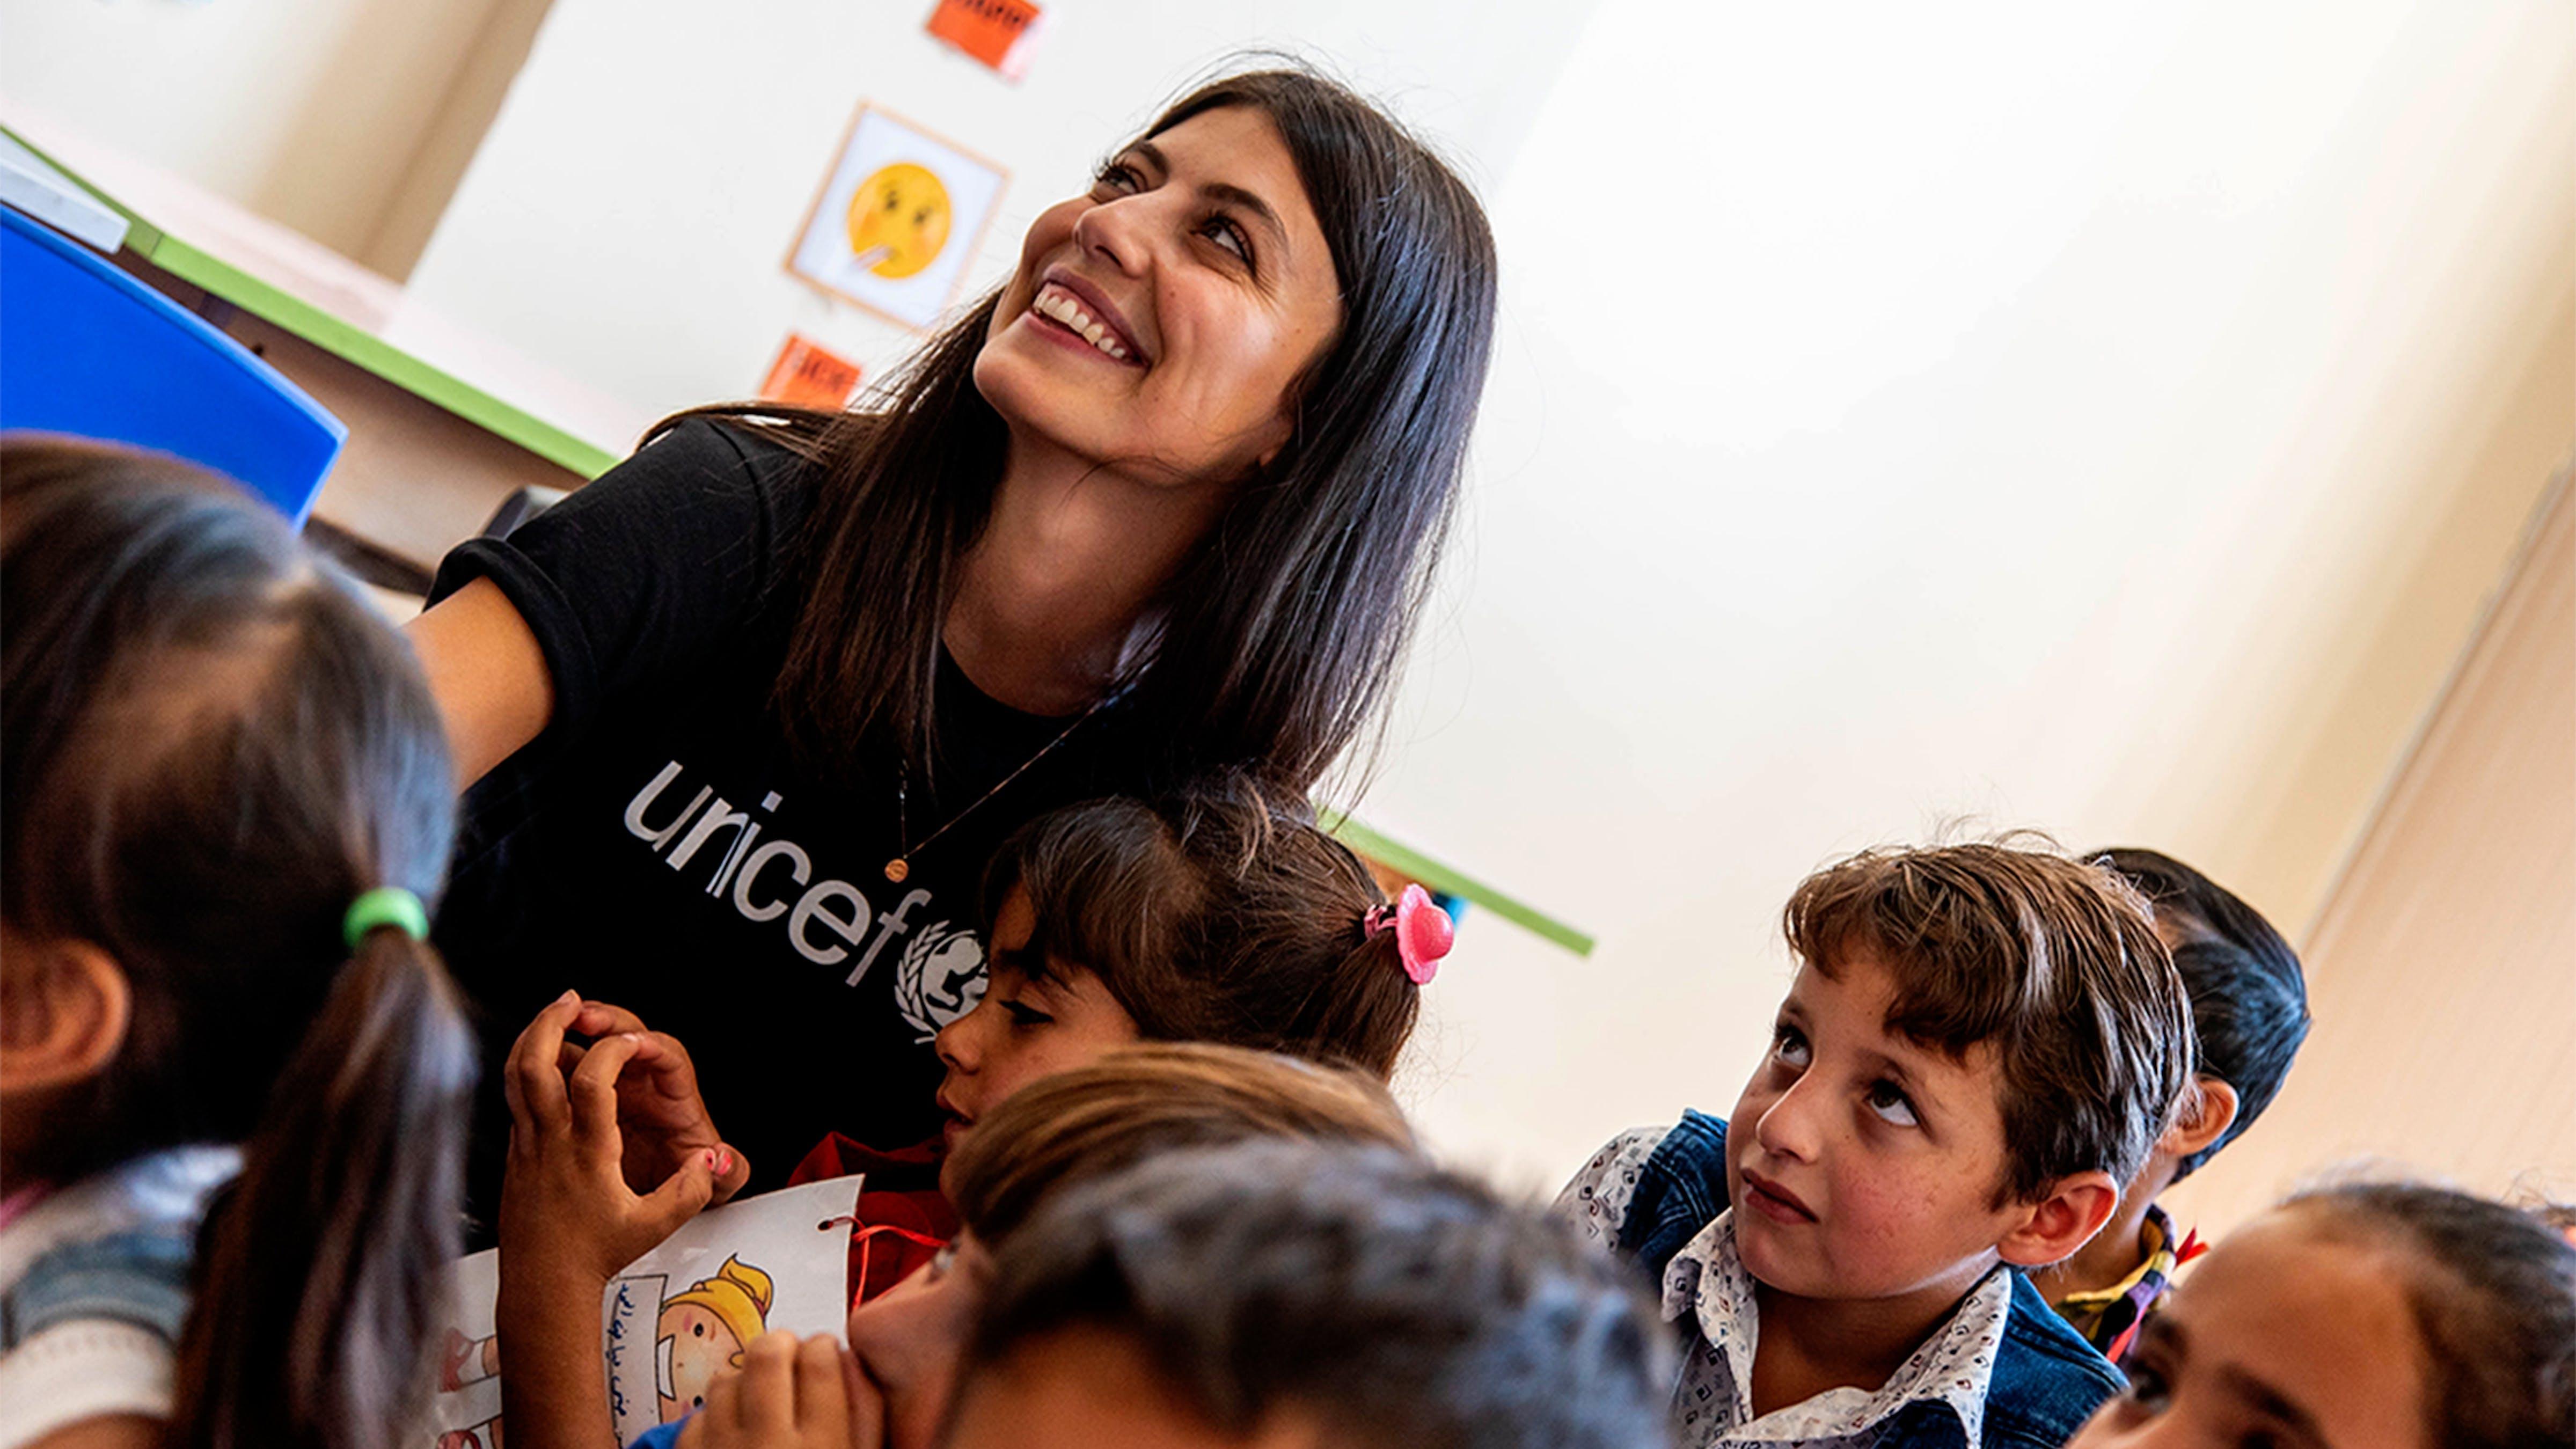 Libano, Alessandra Mastronardi, ambasciatrice UNICEF, sorride assieme ai bambini